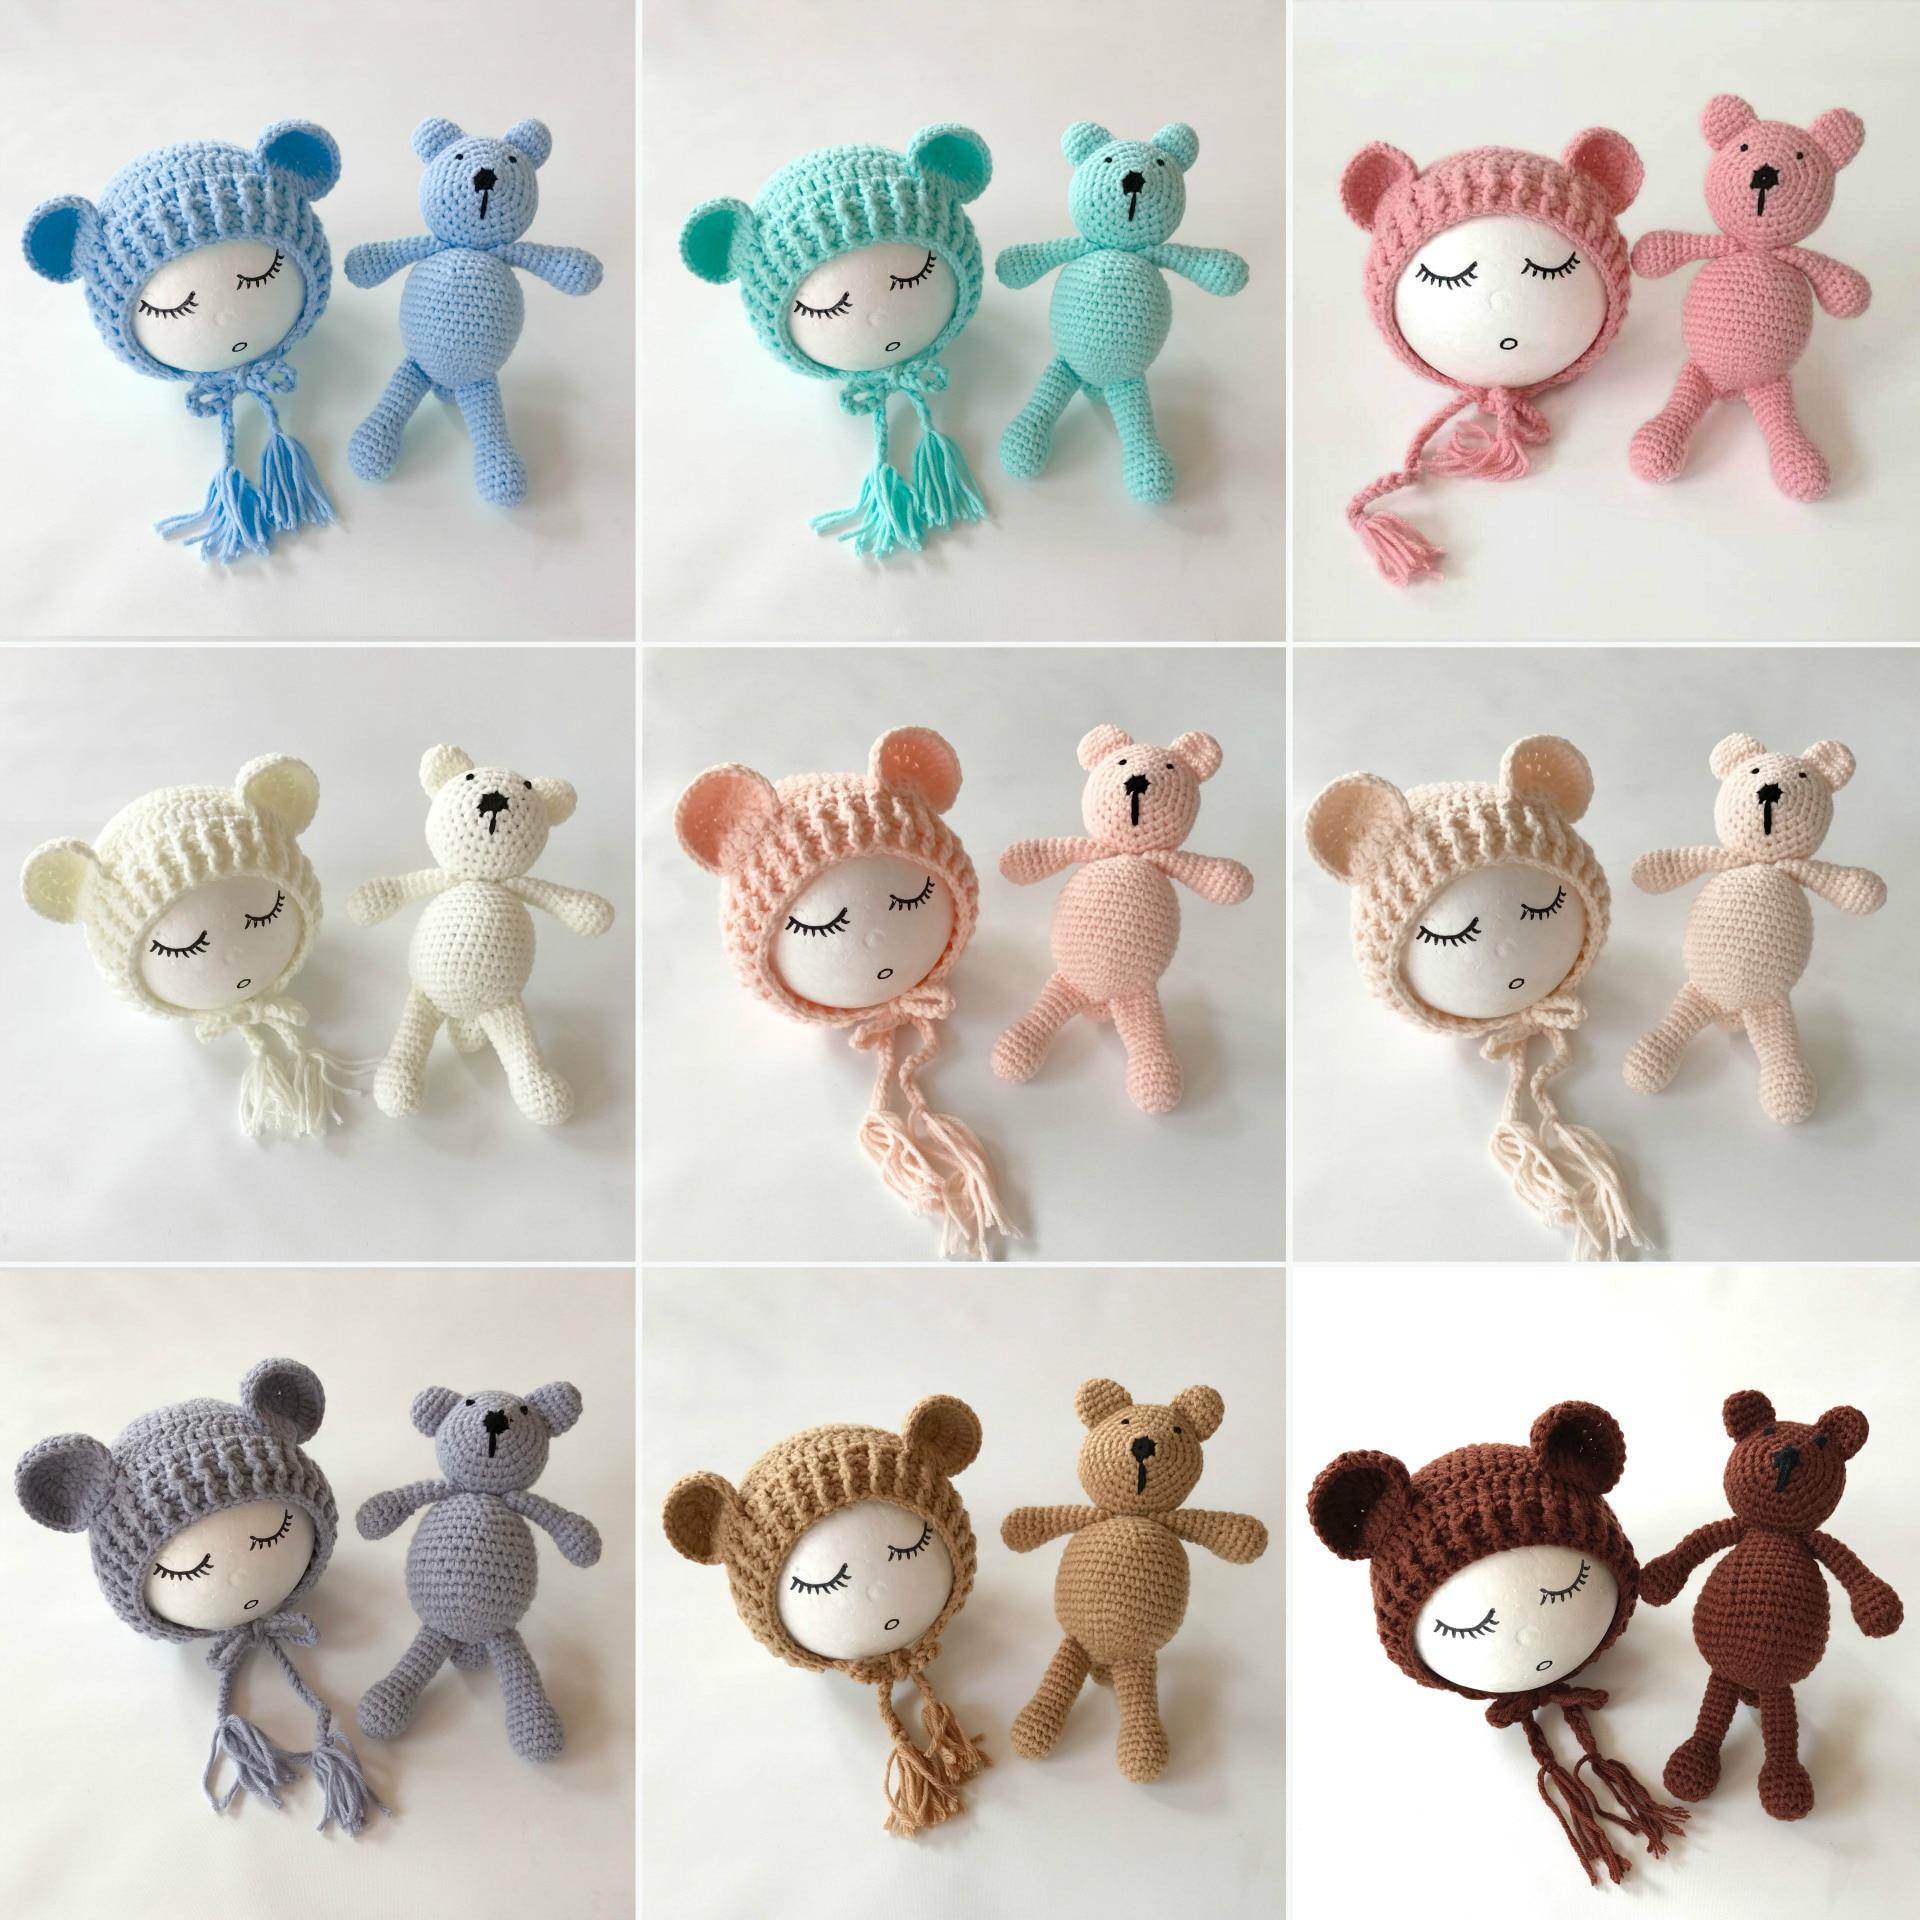 Newborn Photography Props Bears Ear Hat+Toys Set Handmade Knitting Baby Hats Caps Baby Photo Props Accessories Studio Fotografia